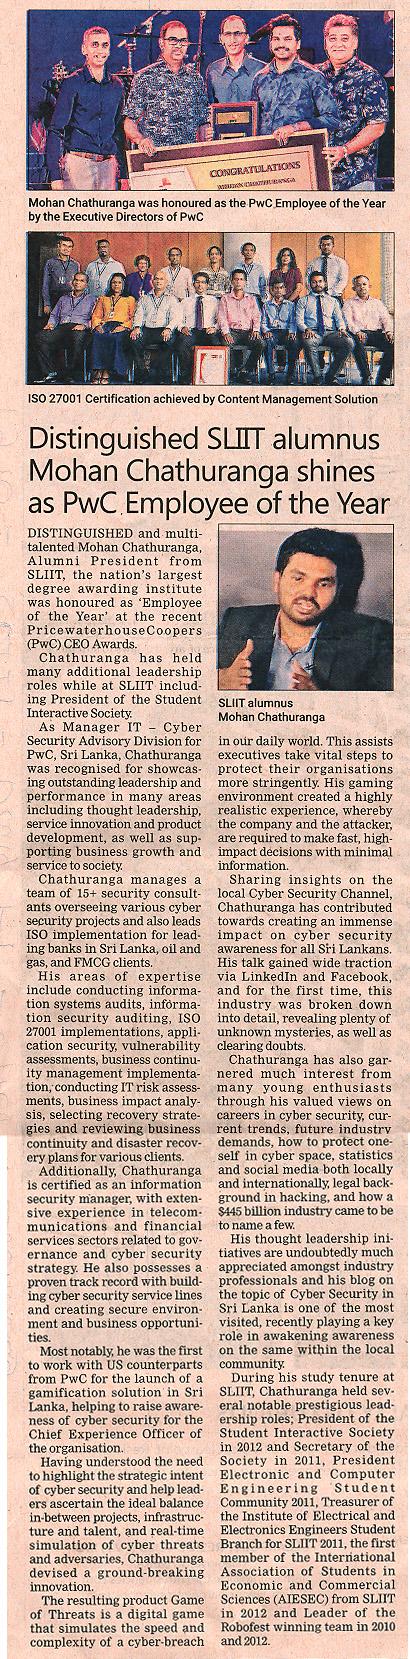 SLIIT-Alumnus-Mohan-Chathuranga-named-PwC-Employee-of-the-Year-Daily-FT-09-01-20191